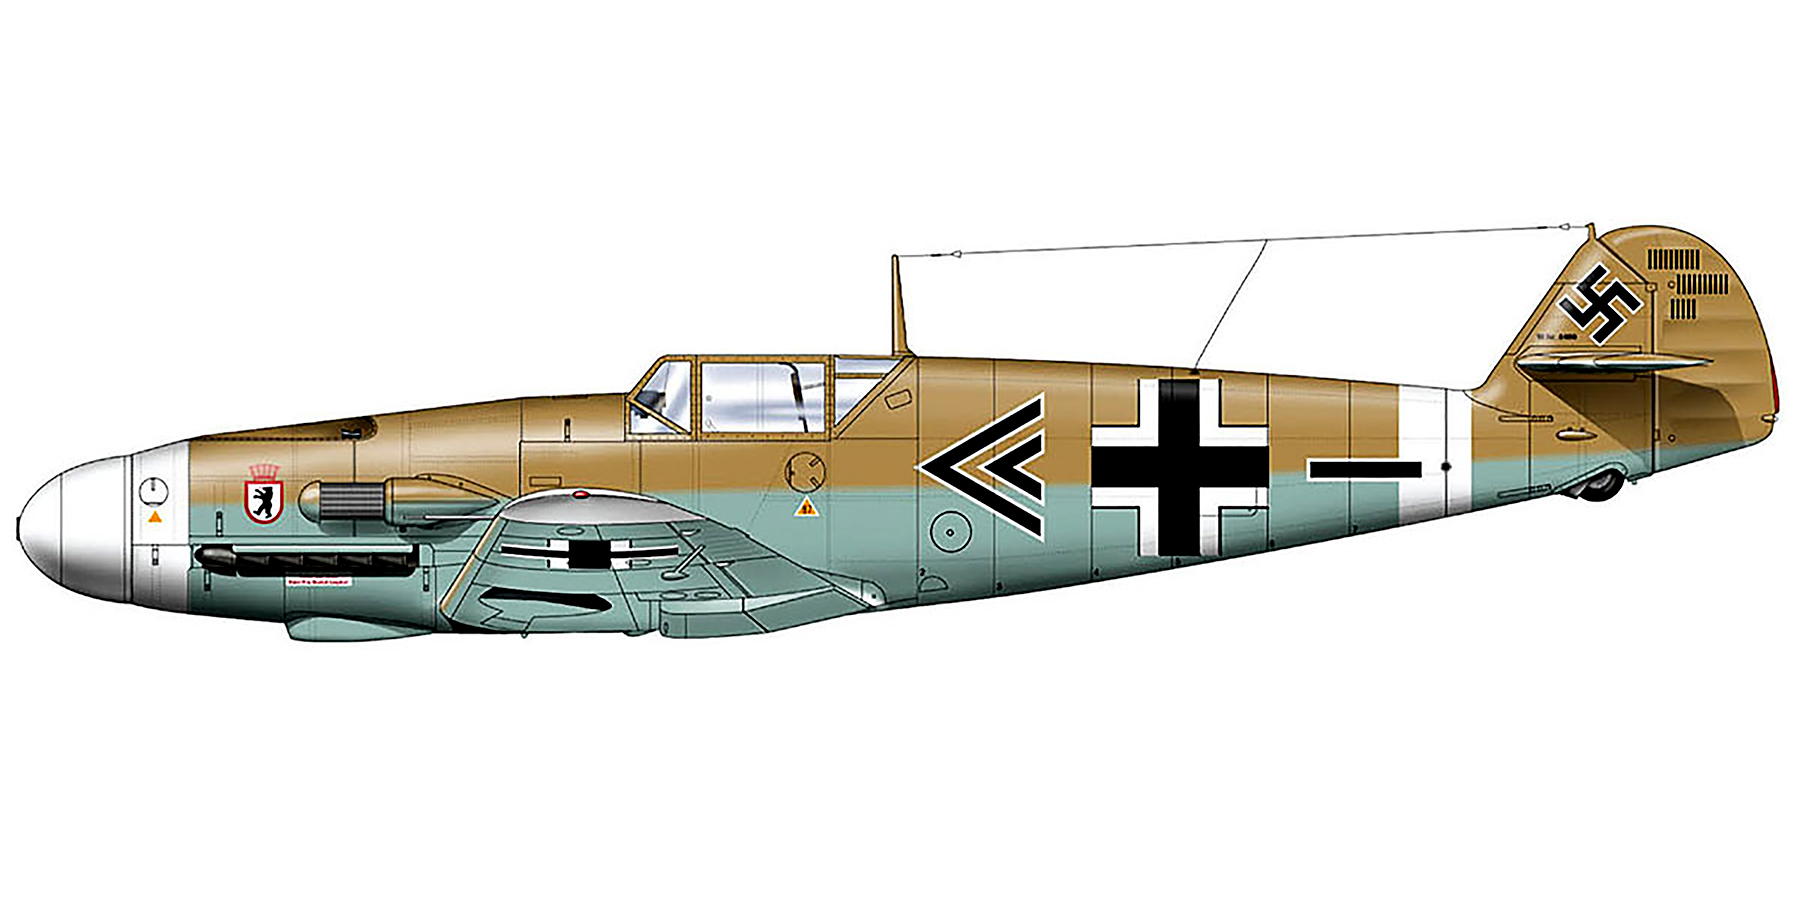 Messerschmitt Bf 109F4Trop Stab II.JG27 Wolfgang Lippert WNr 8469 El Gazala Libya 1941 0A